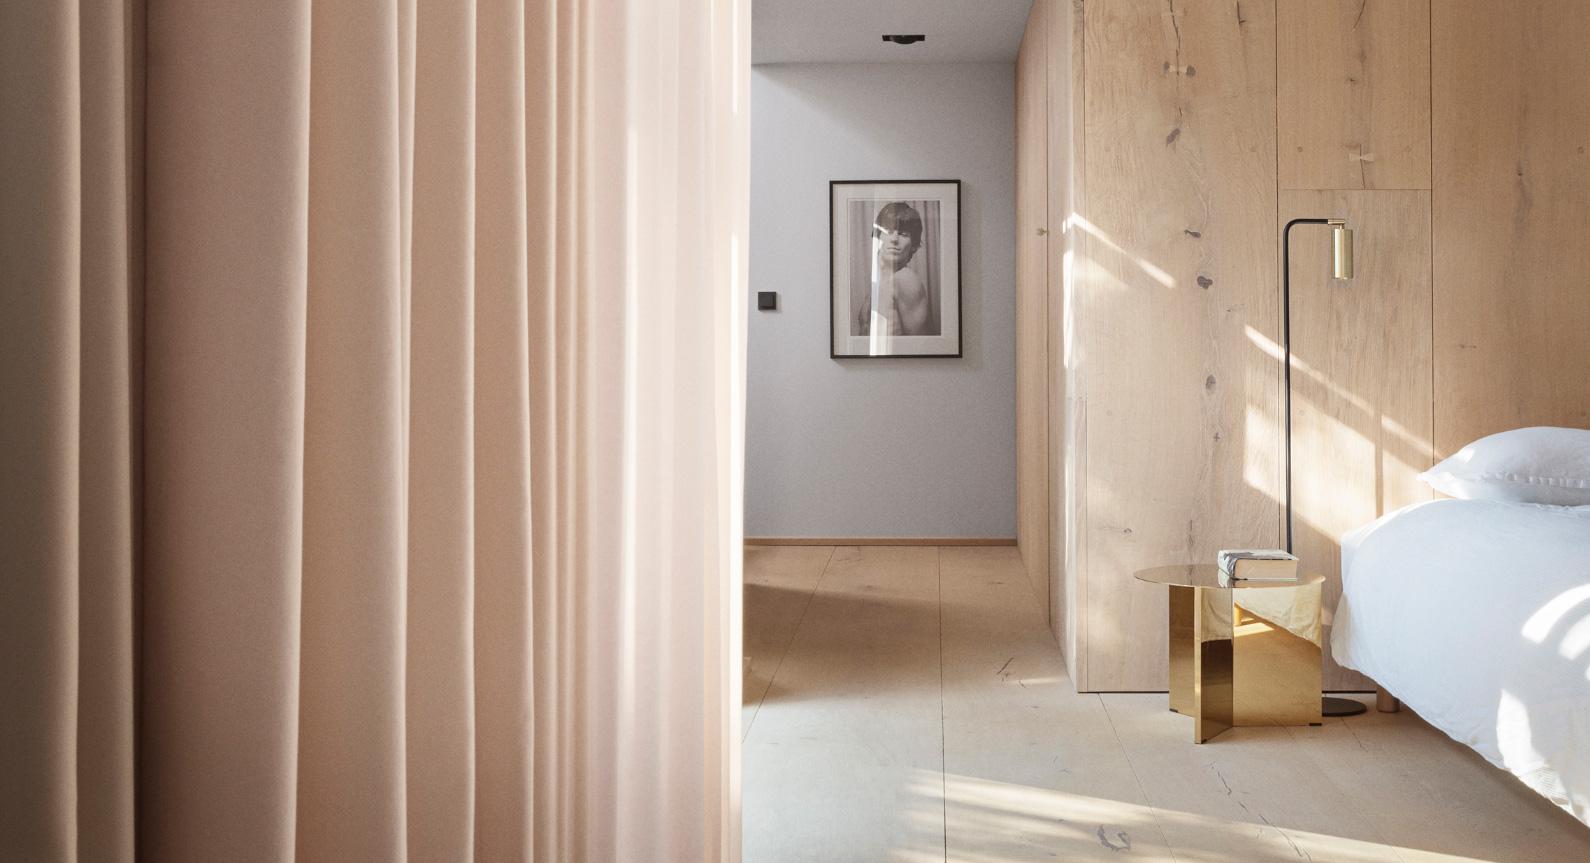 Studio David Thulstrup Transform Warehouse Into A Modern Photographer's Home